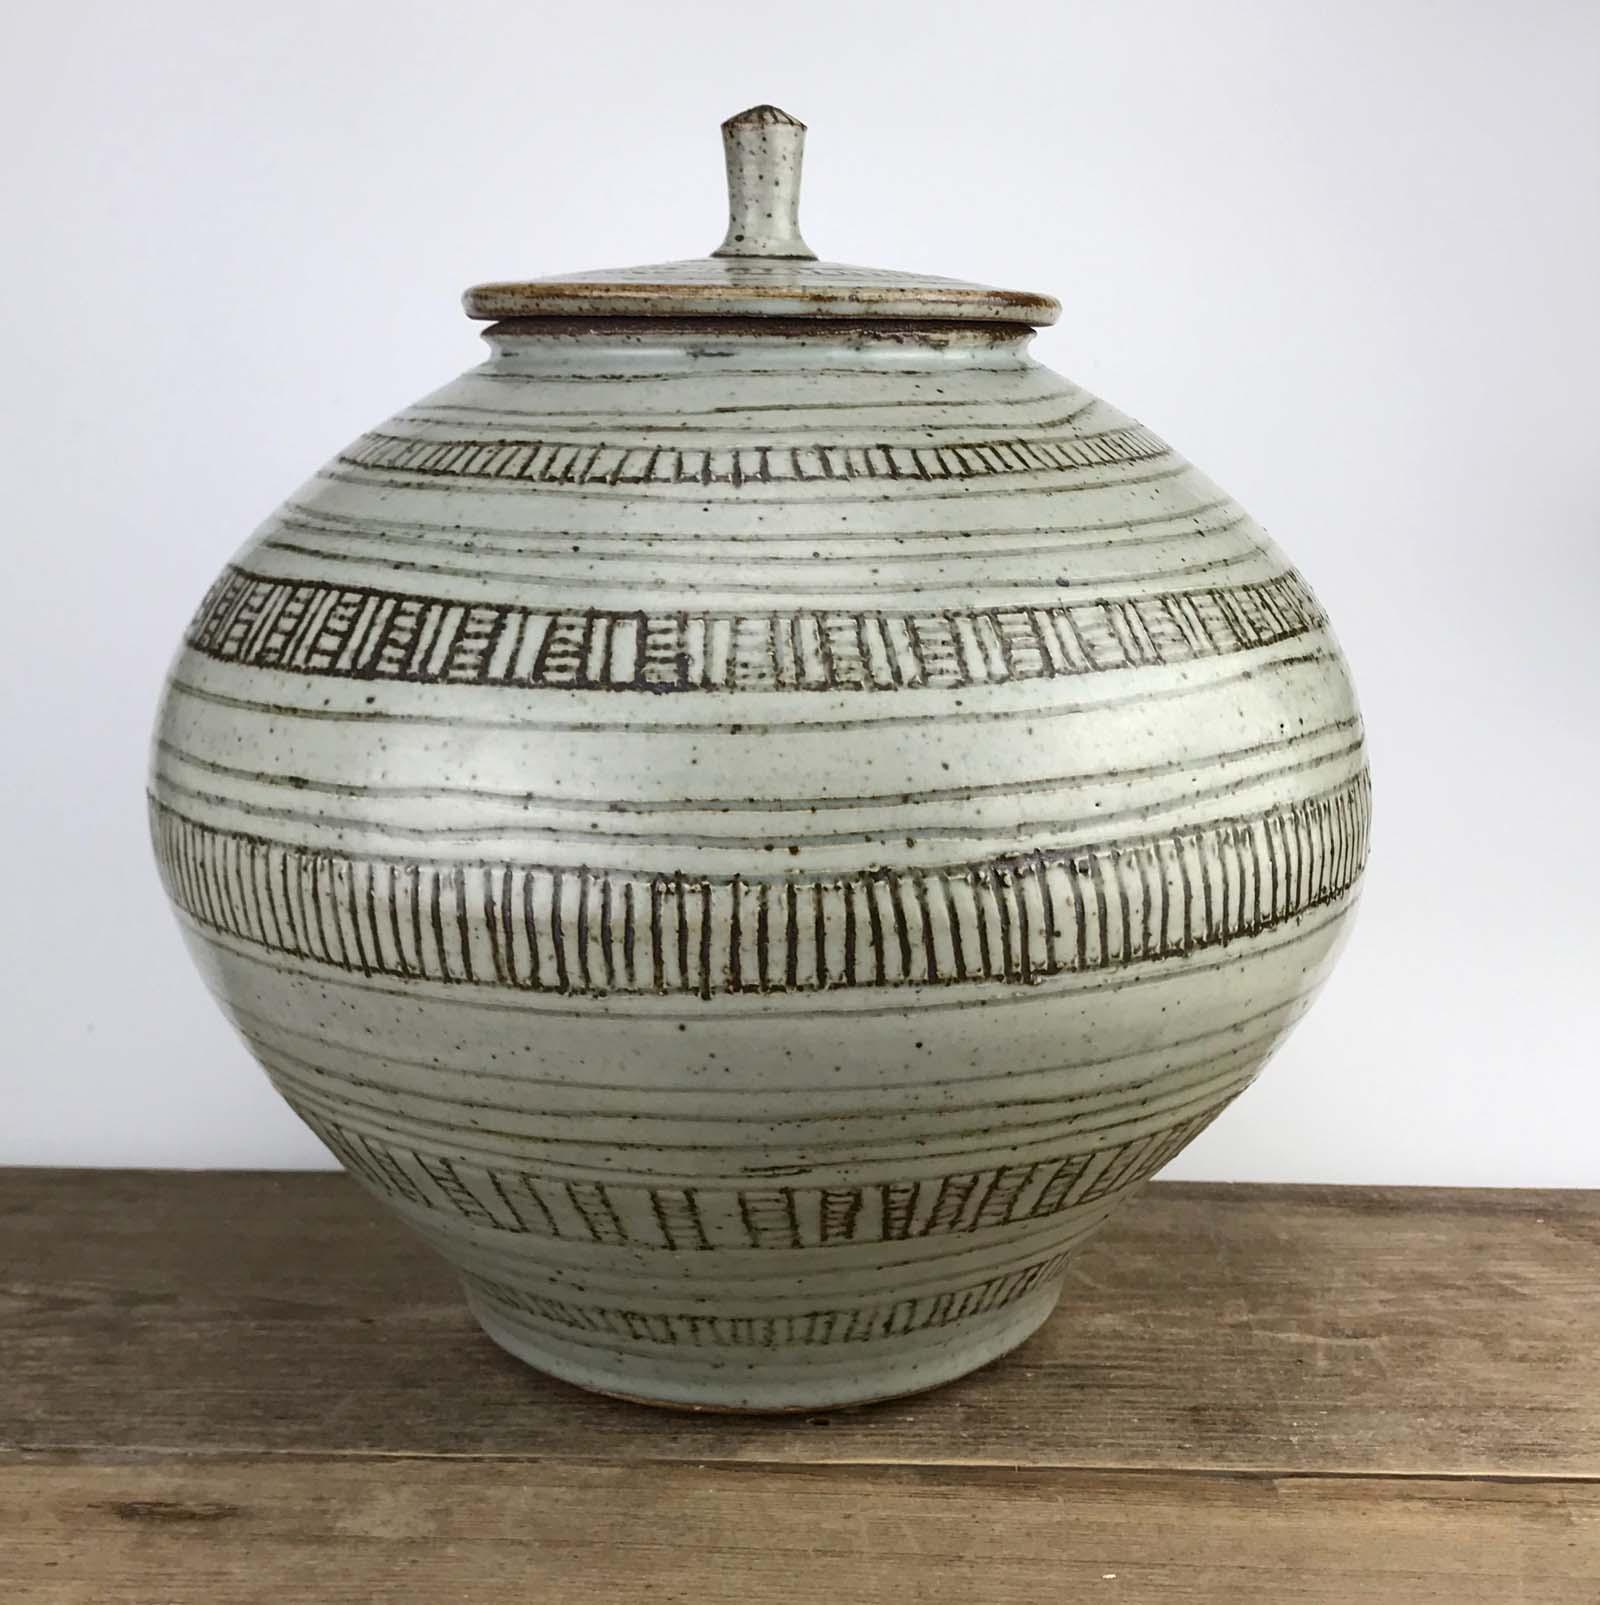 photo of a lidded stoneware jar